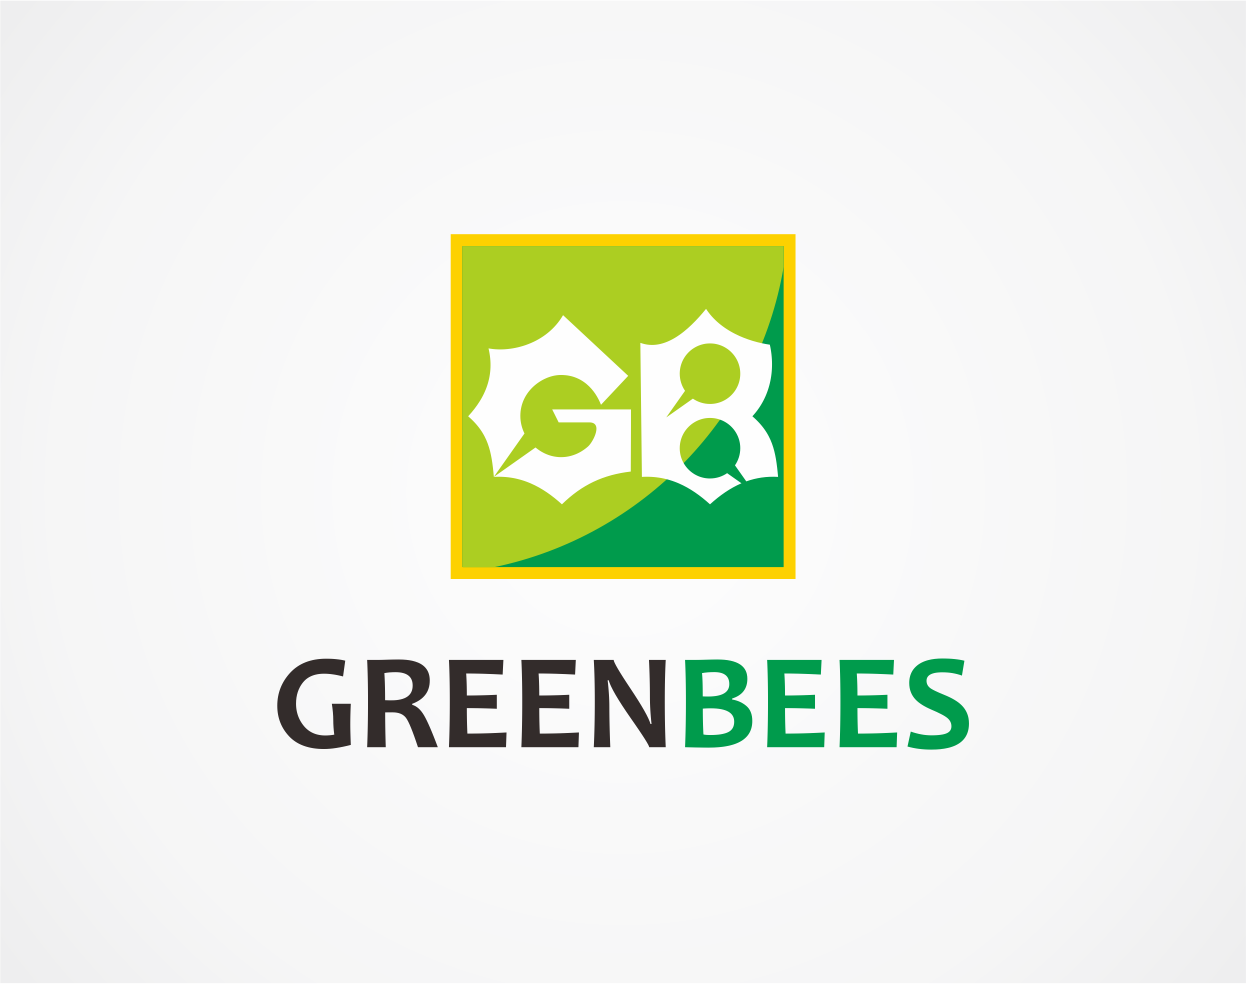 Logo Design by Armada Jamaluddin - Entry No. 375 in the Logo Design Contest Greenbees Logo Design.